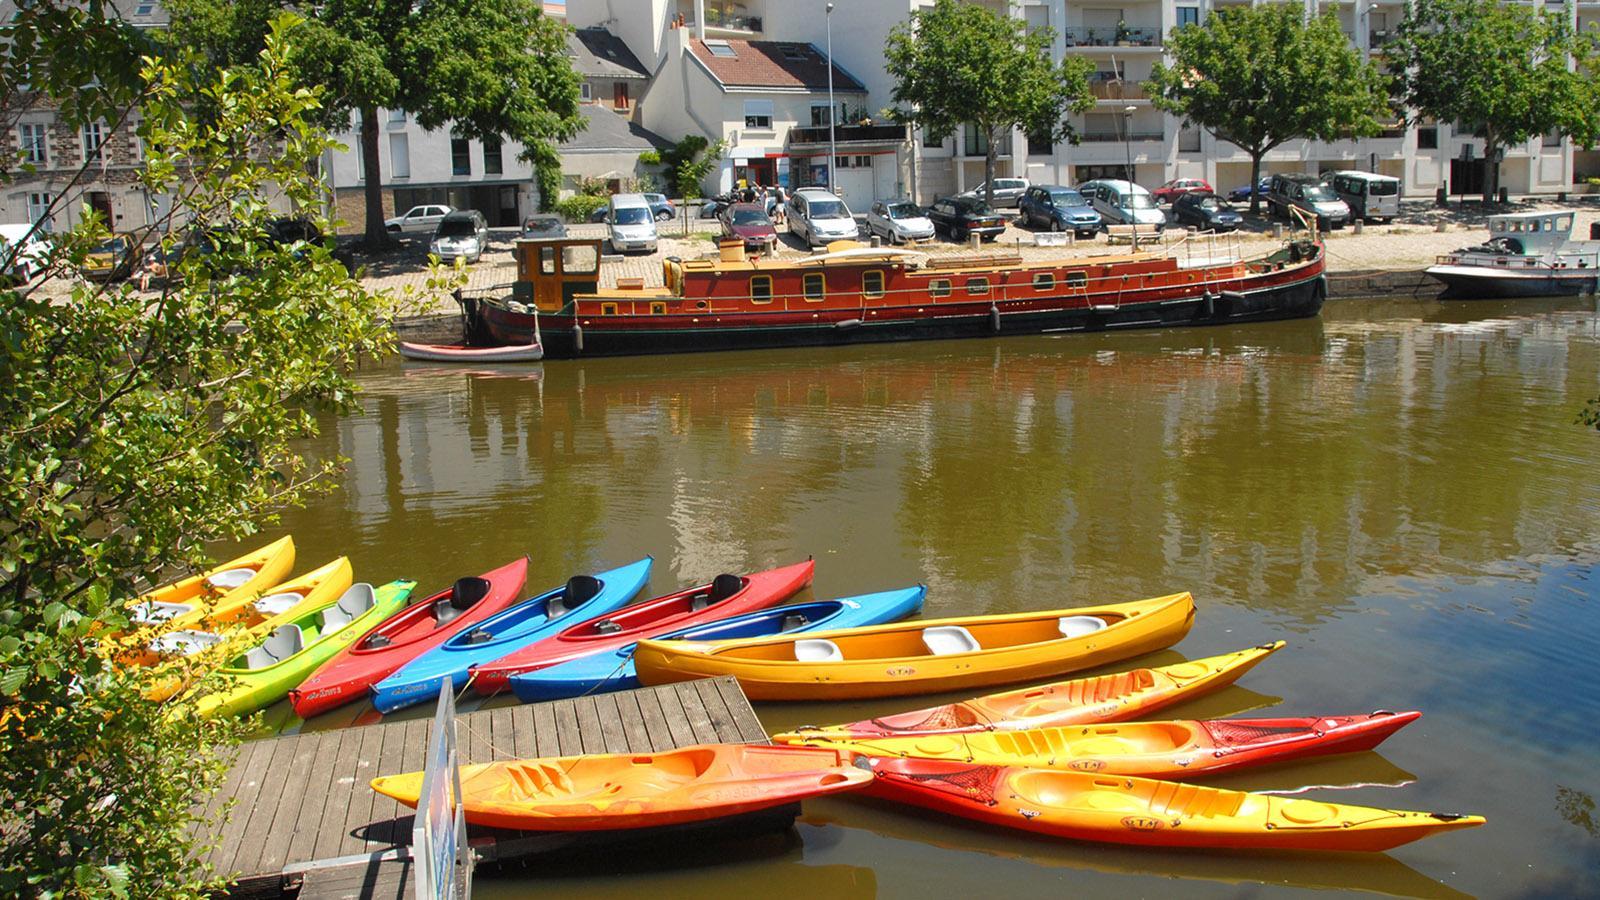 Nantes: Bootsverleih an der Erde. Foto: Hilke Maudner